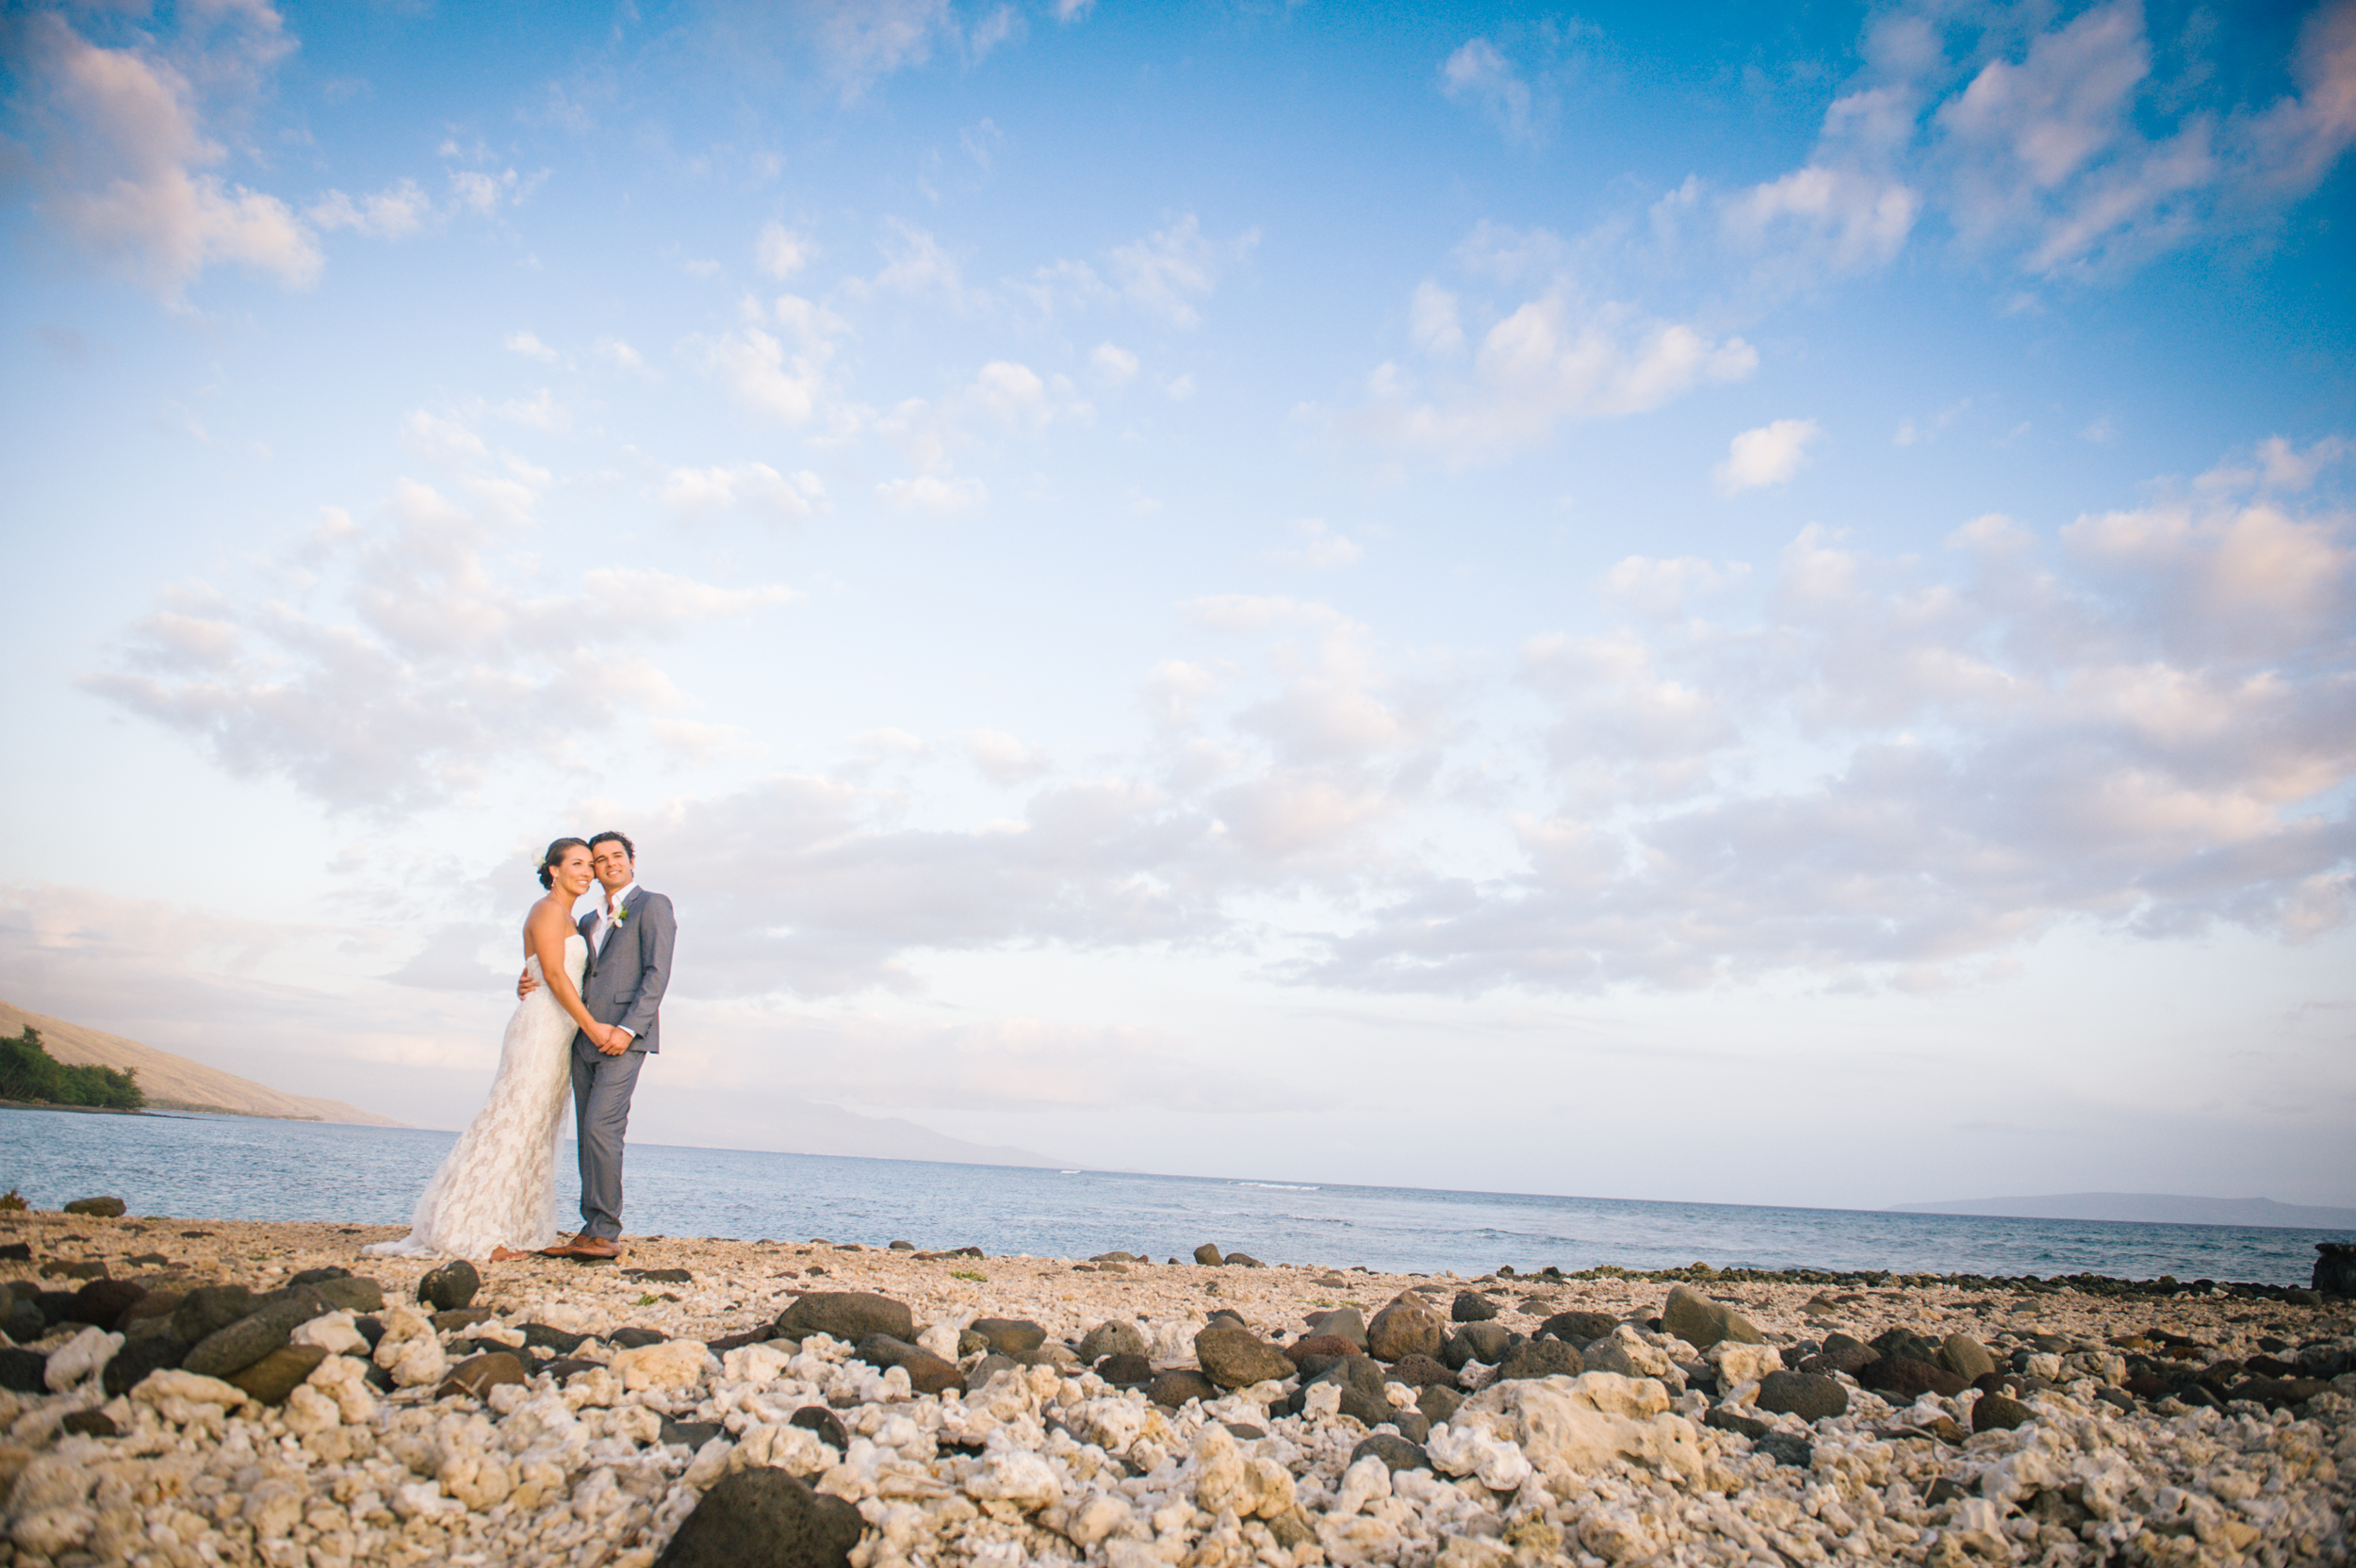 JKP-Destination-Weddings-0033.JPG